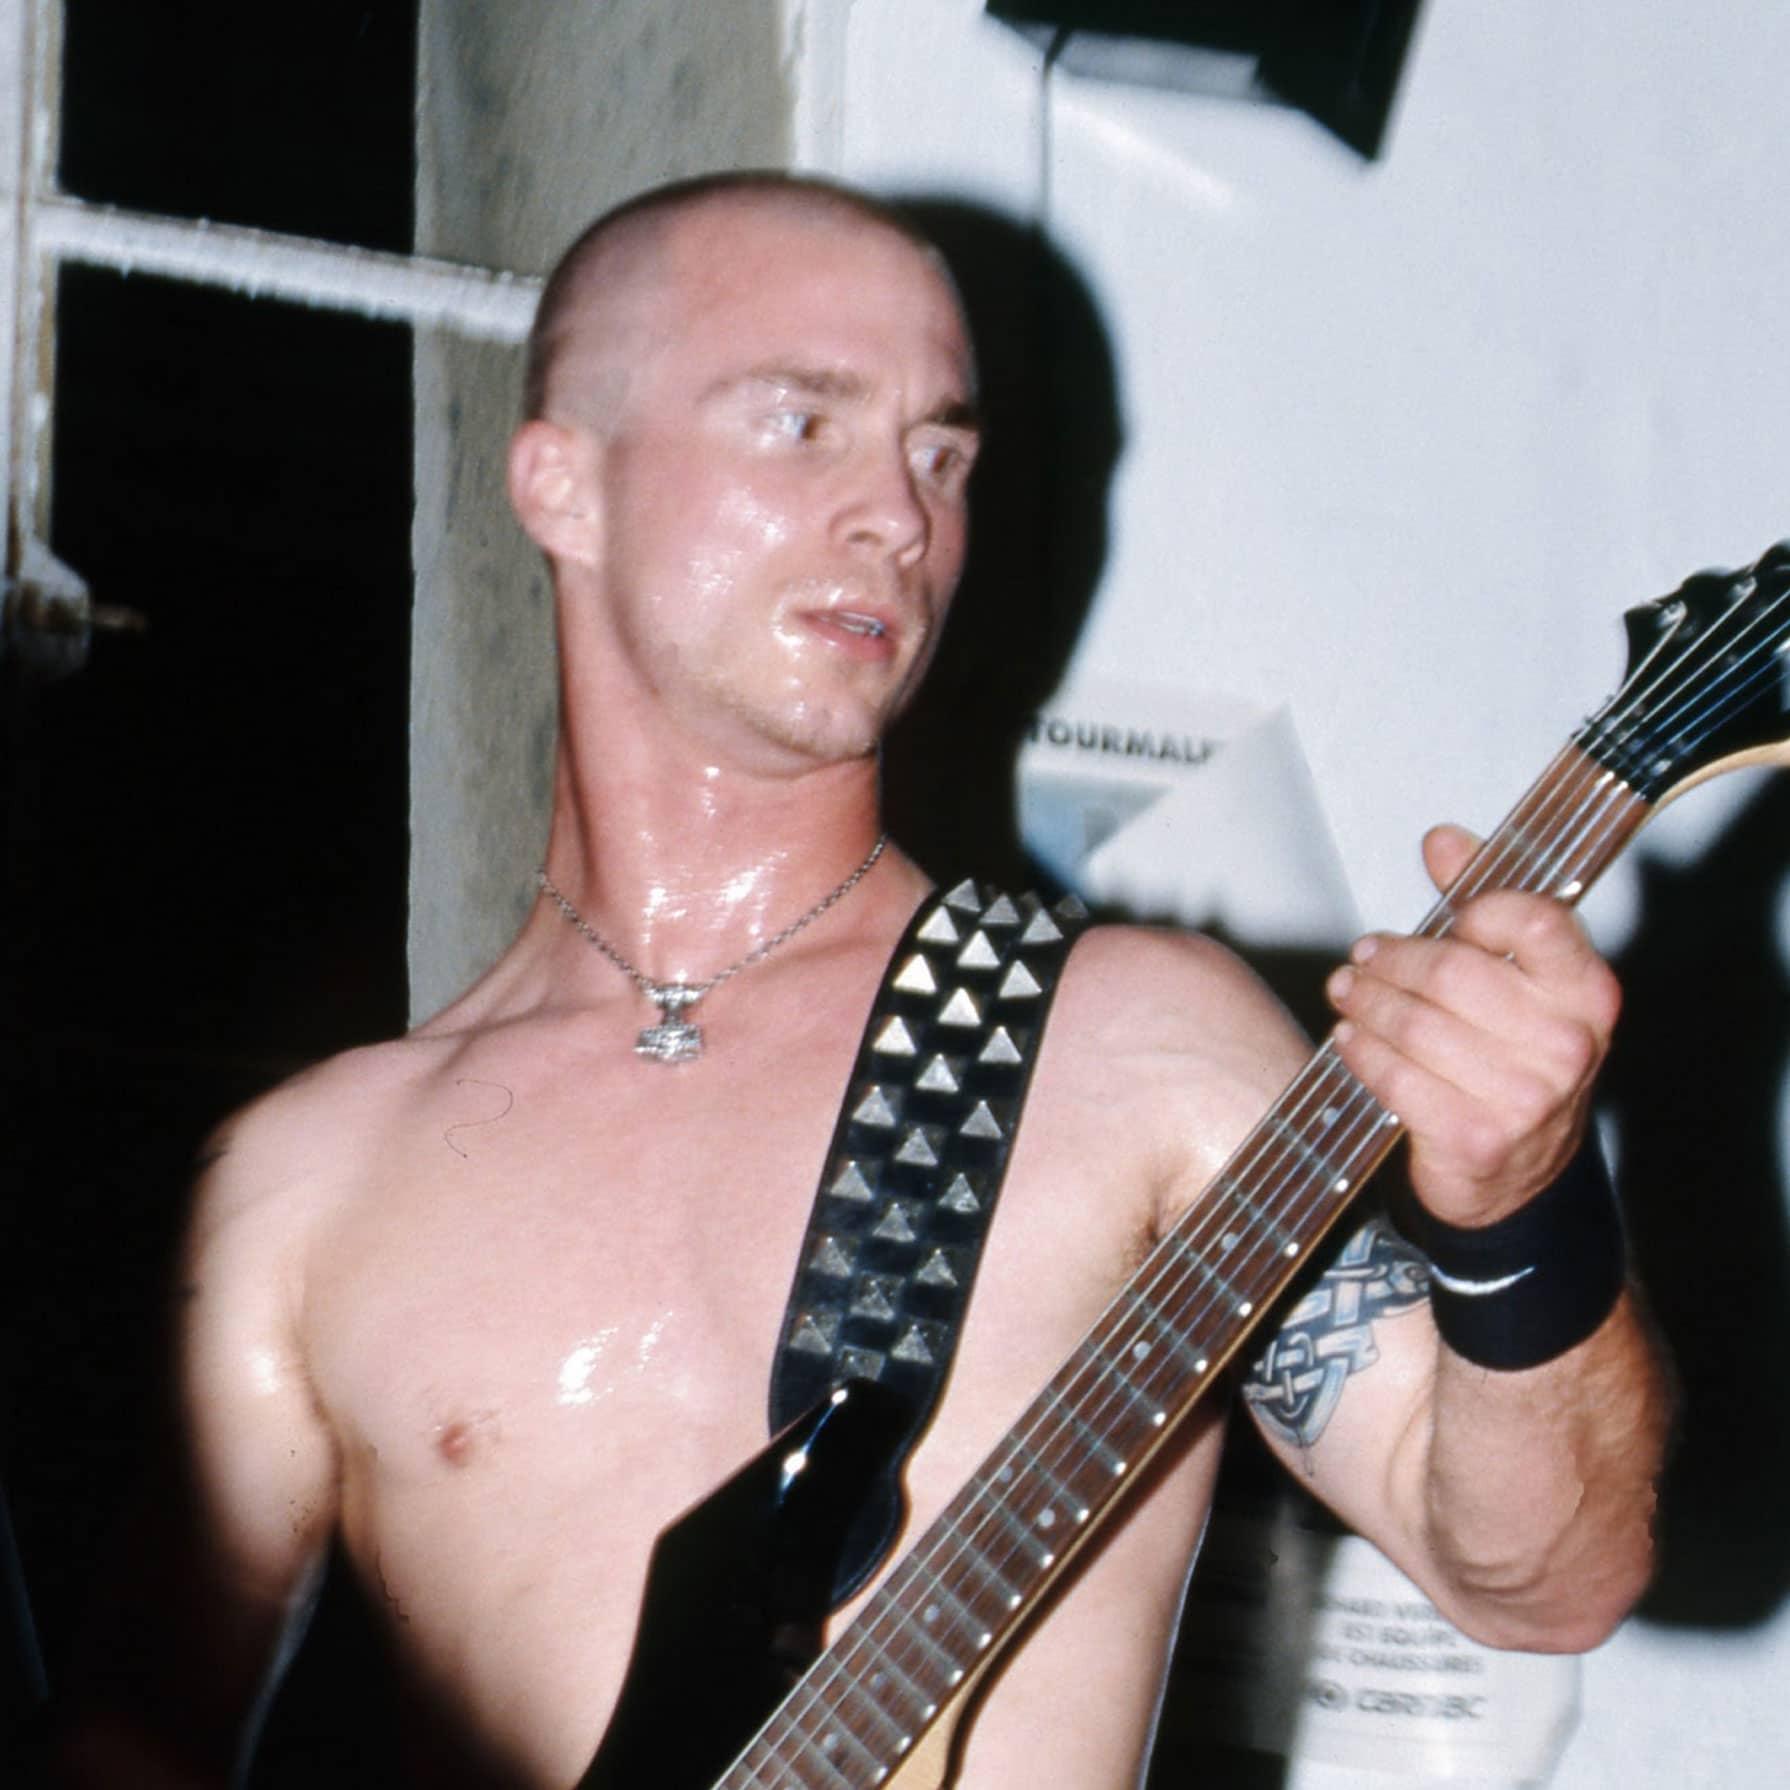 Brice Guitare : 1998-2000